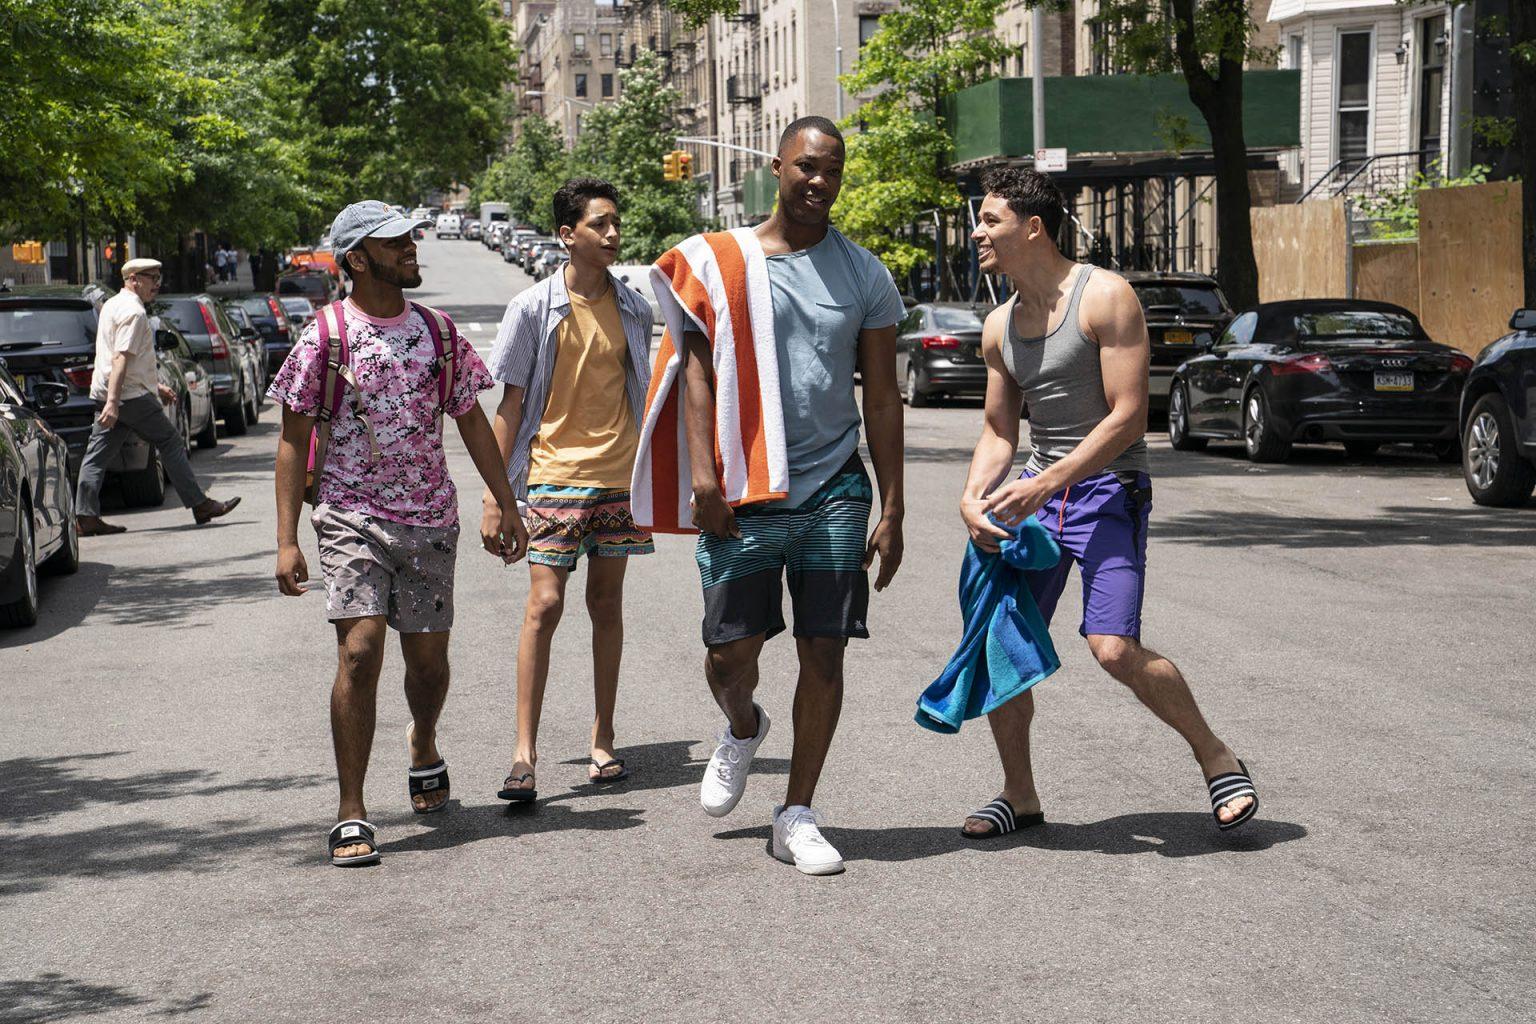 Sognando a New York - In the Heights recensione film di Jon M. Chu